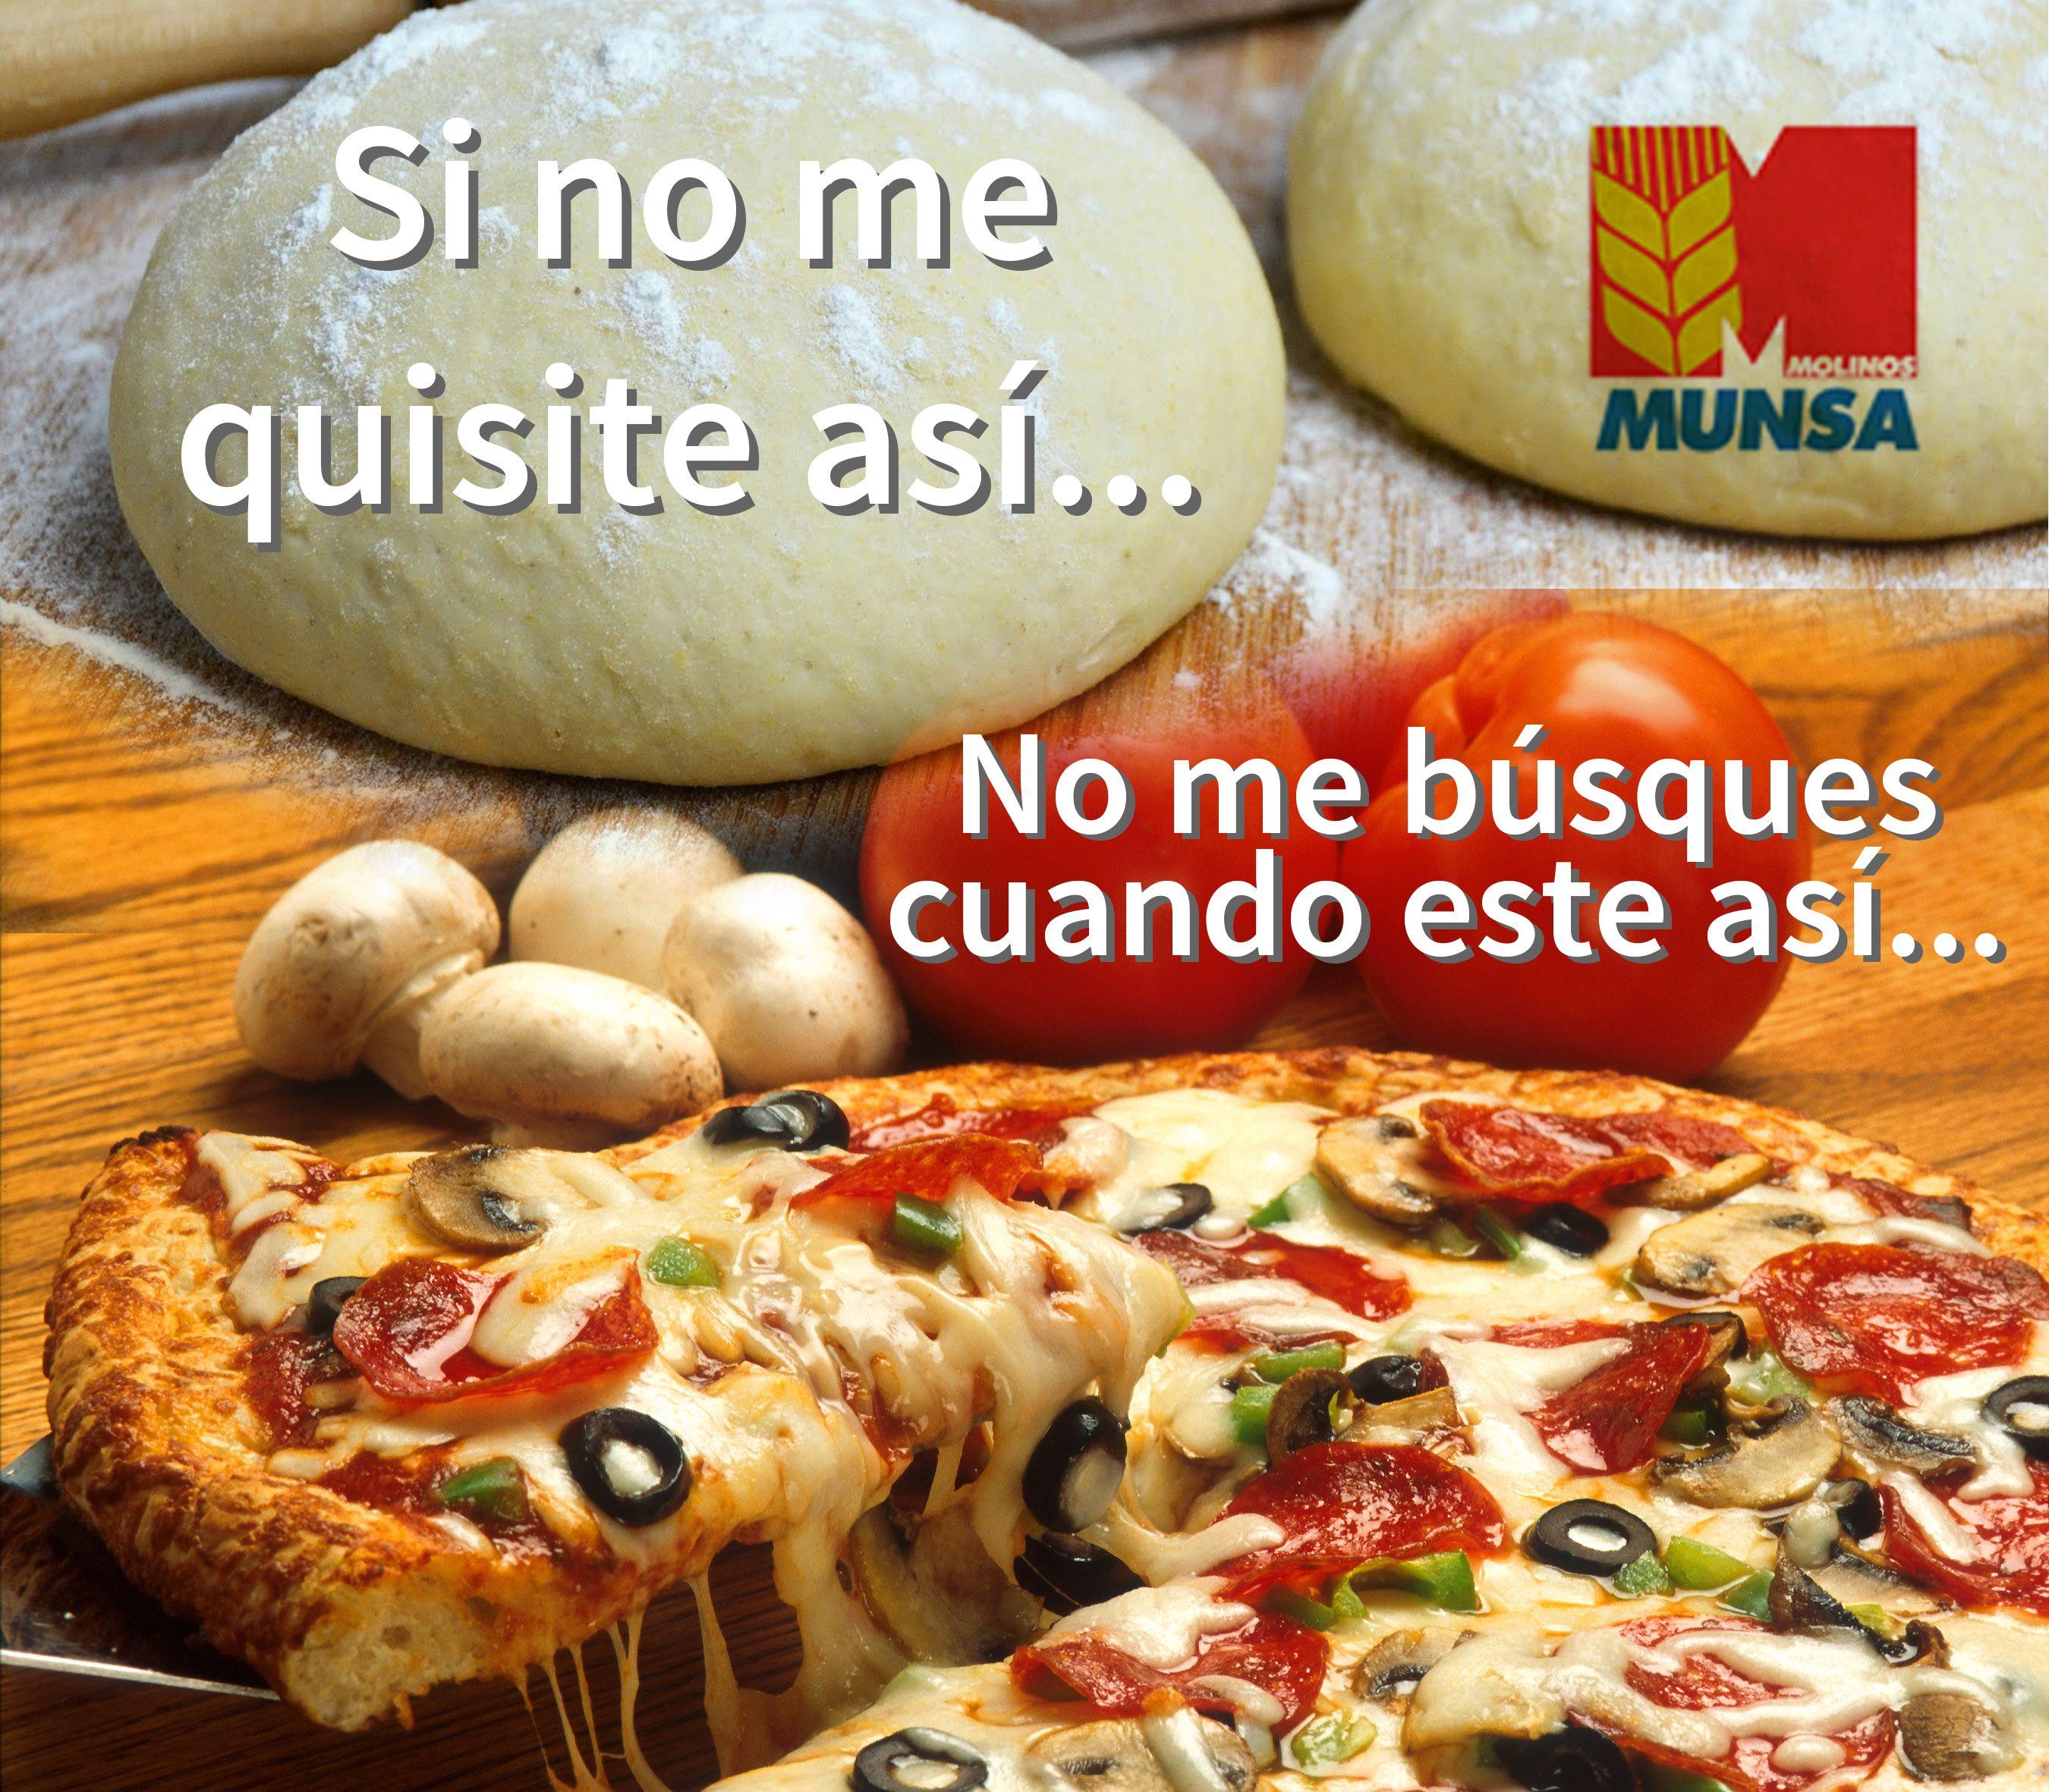 Esperamos sacarte una sonrisa... #ViernesDeHumor #MeGustaTV4 http://www.munsa.com.mx/blog.php